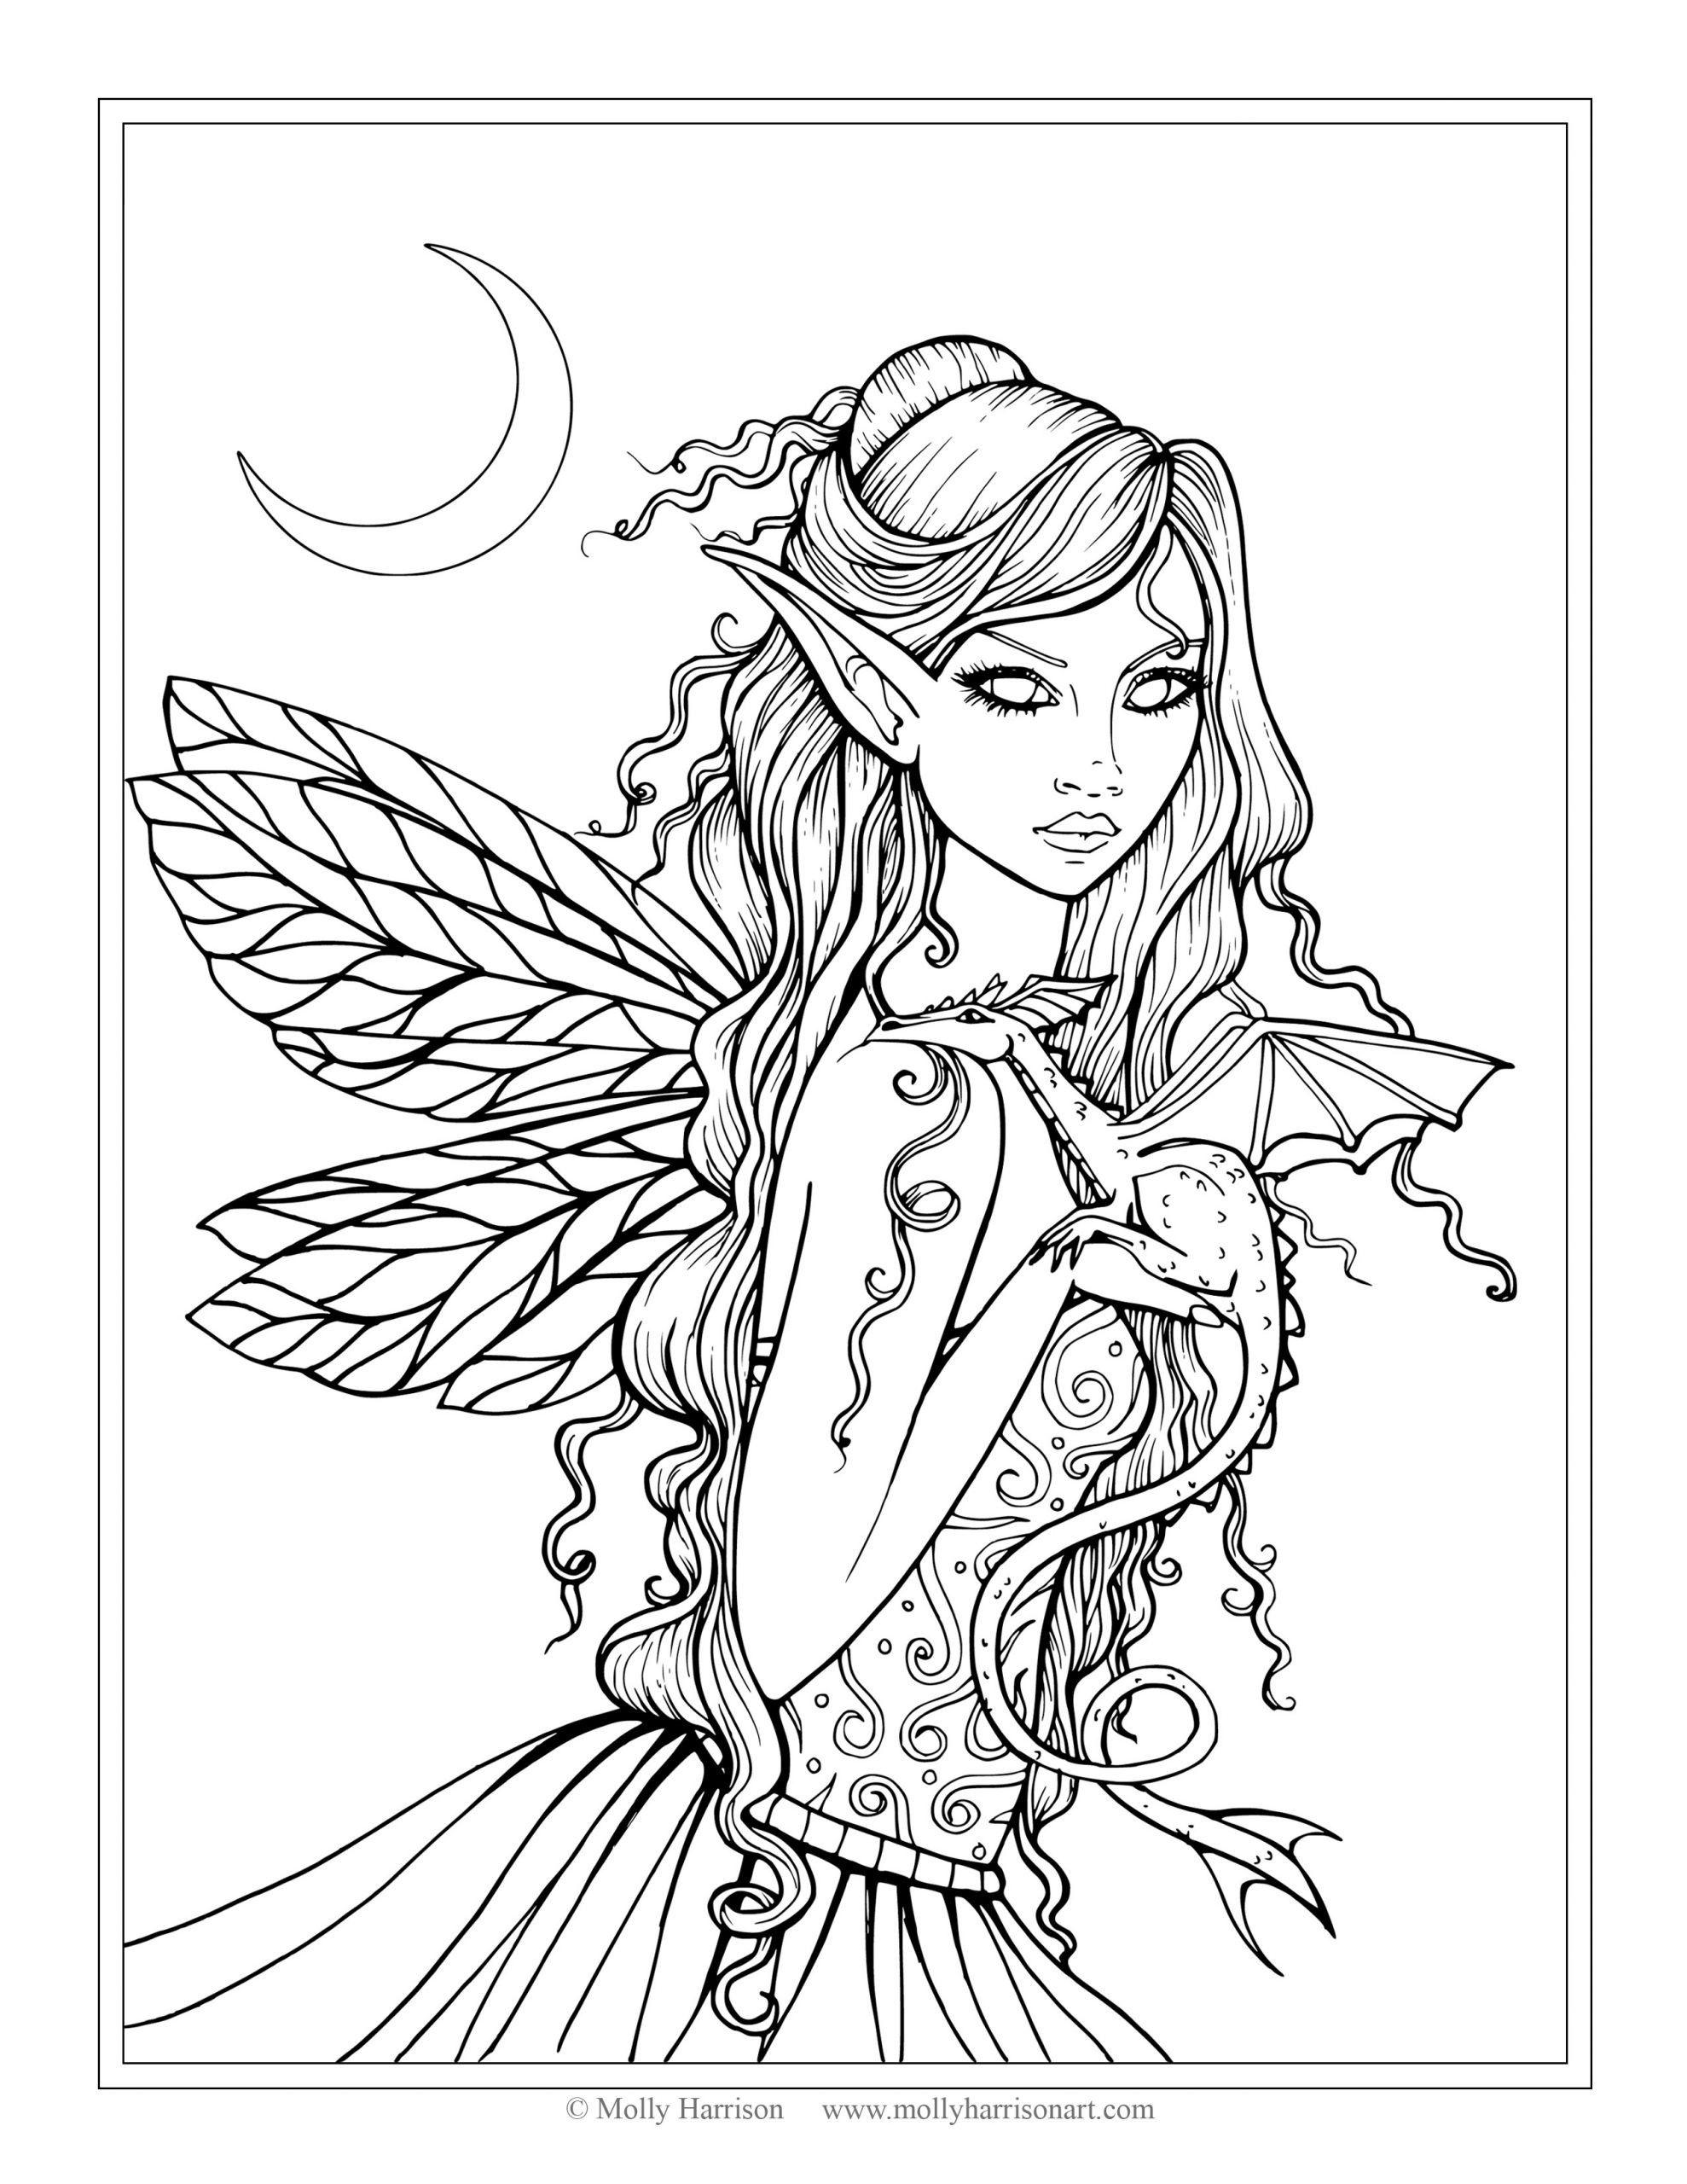 Mermaid Cat Coloring Page Youngandtae Com Dragon Coloring Page Fairy Coloring Pages Fairy Coloring [ 2560 x 1978 Pixel ]